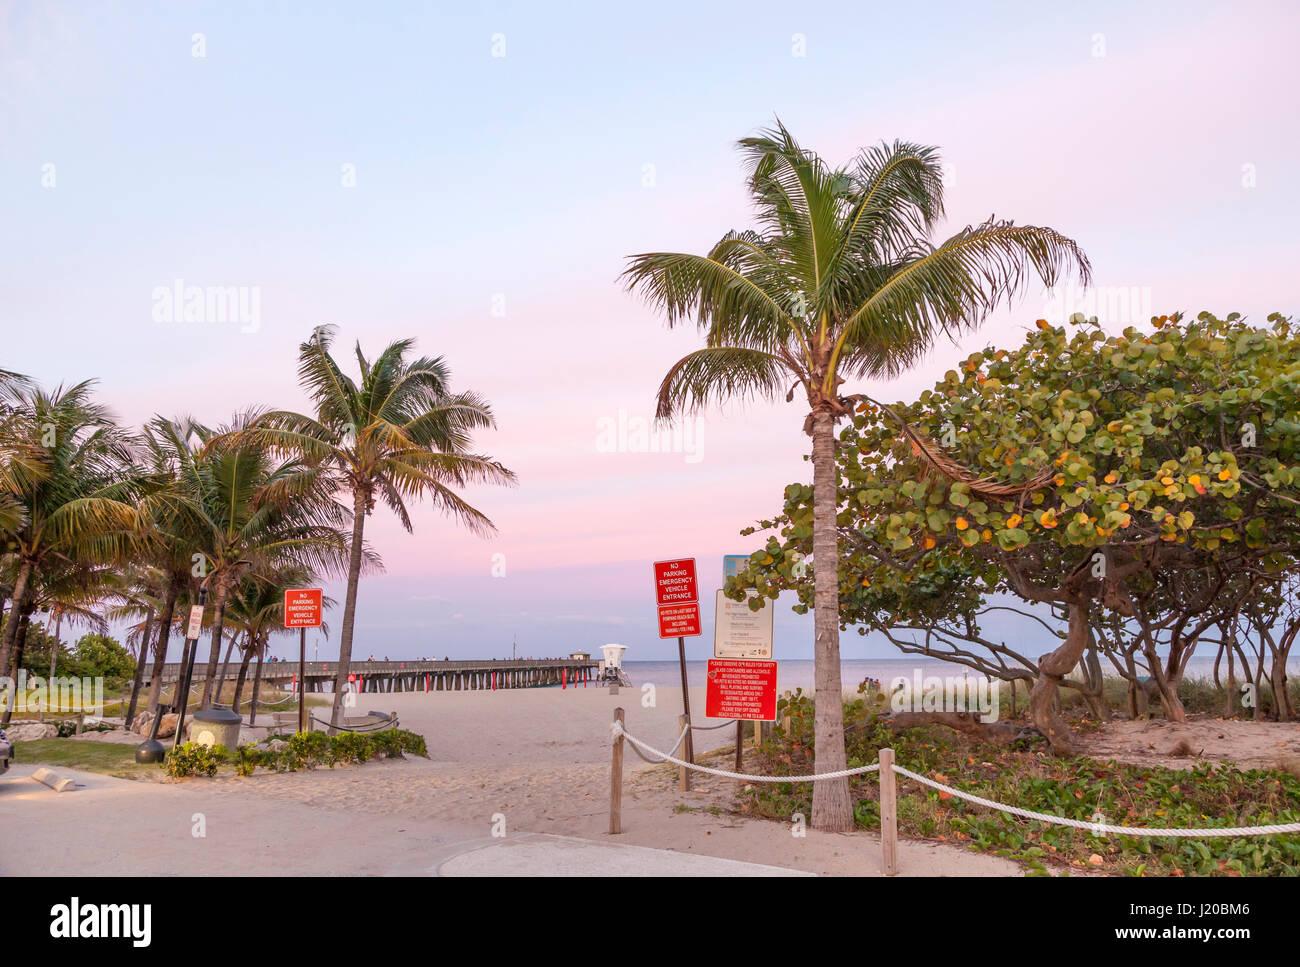 Pompano Beach Pier at dusk. Florida, United States - Stock Image